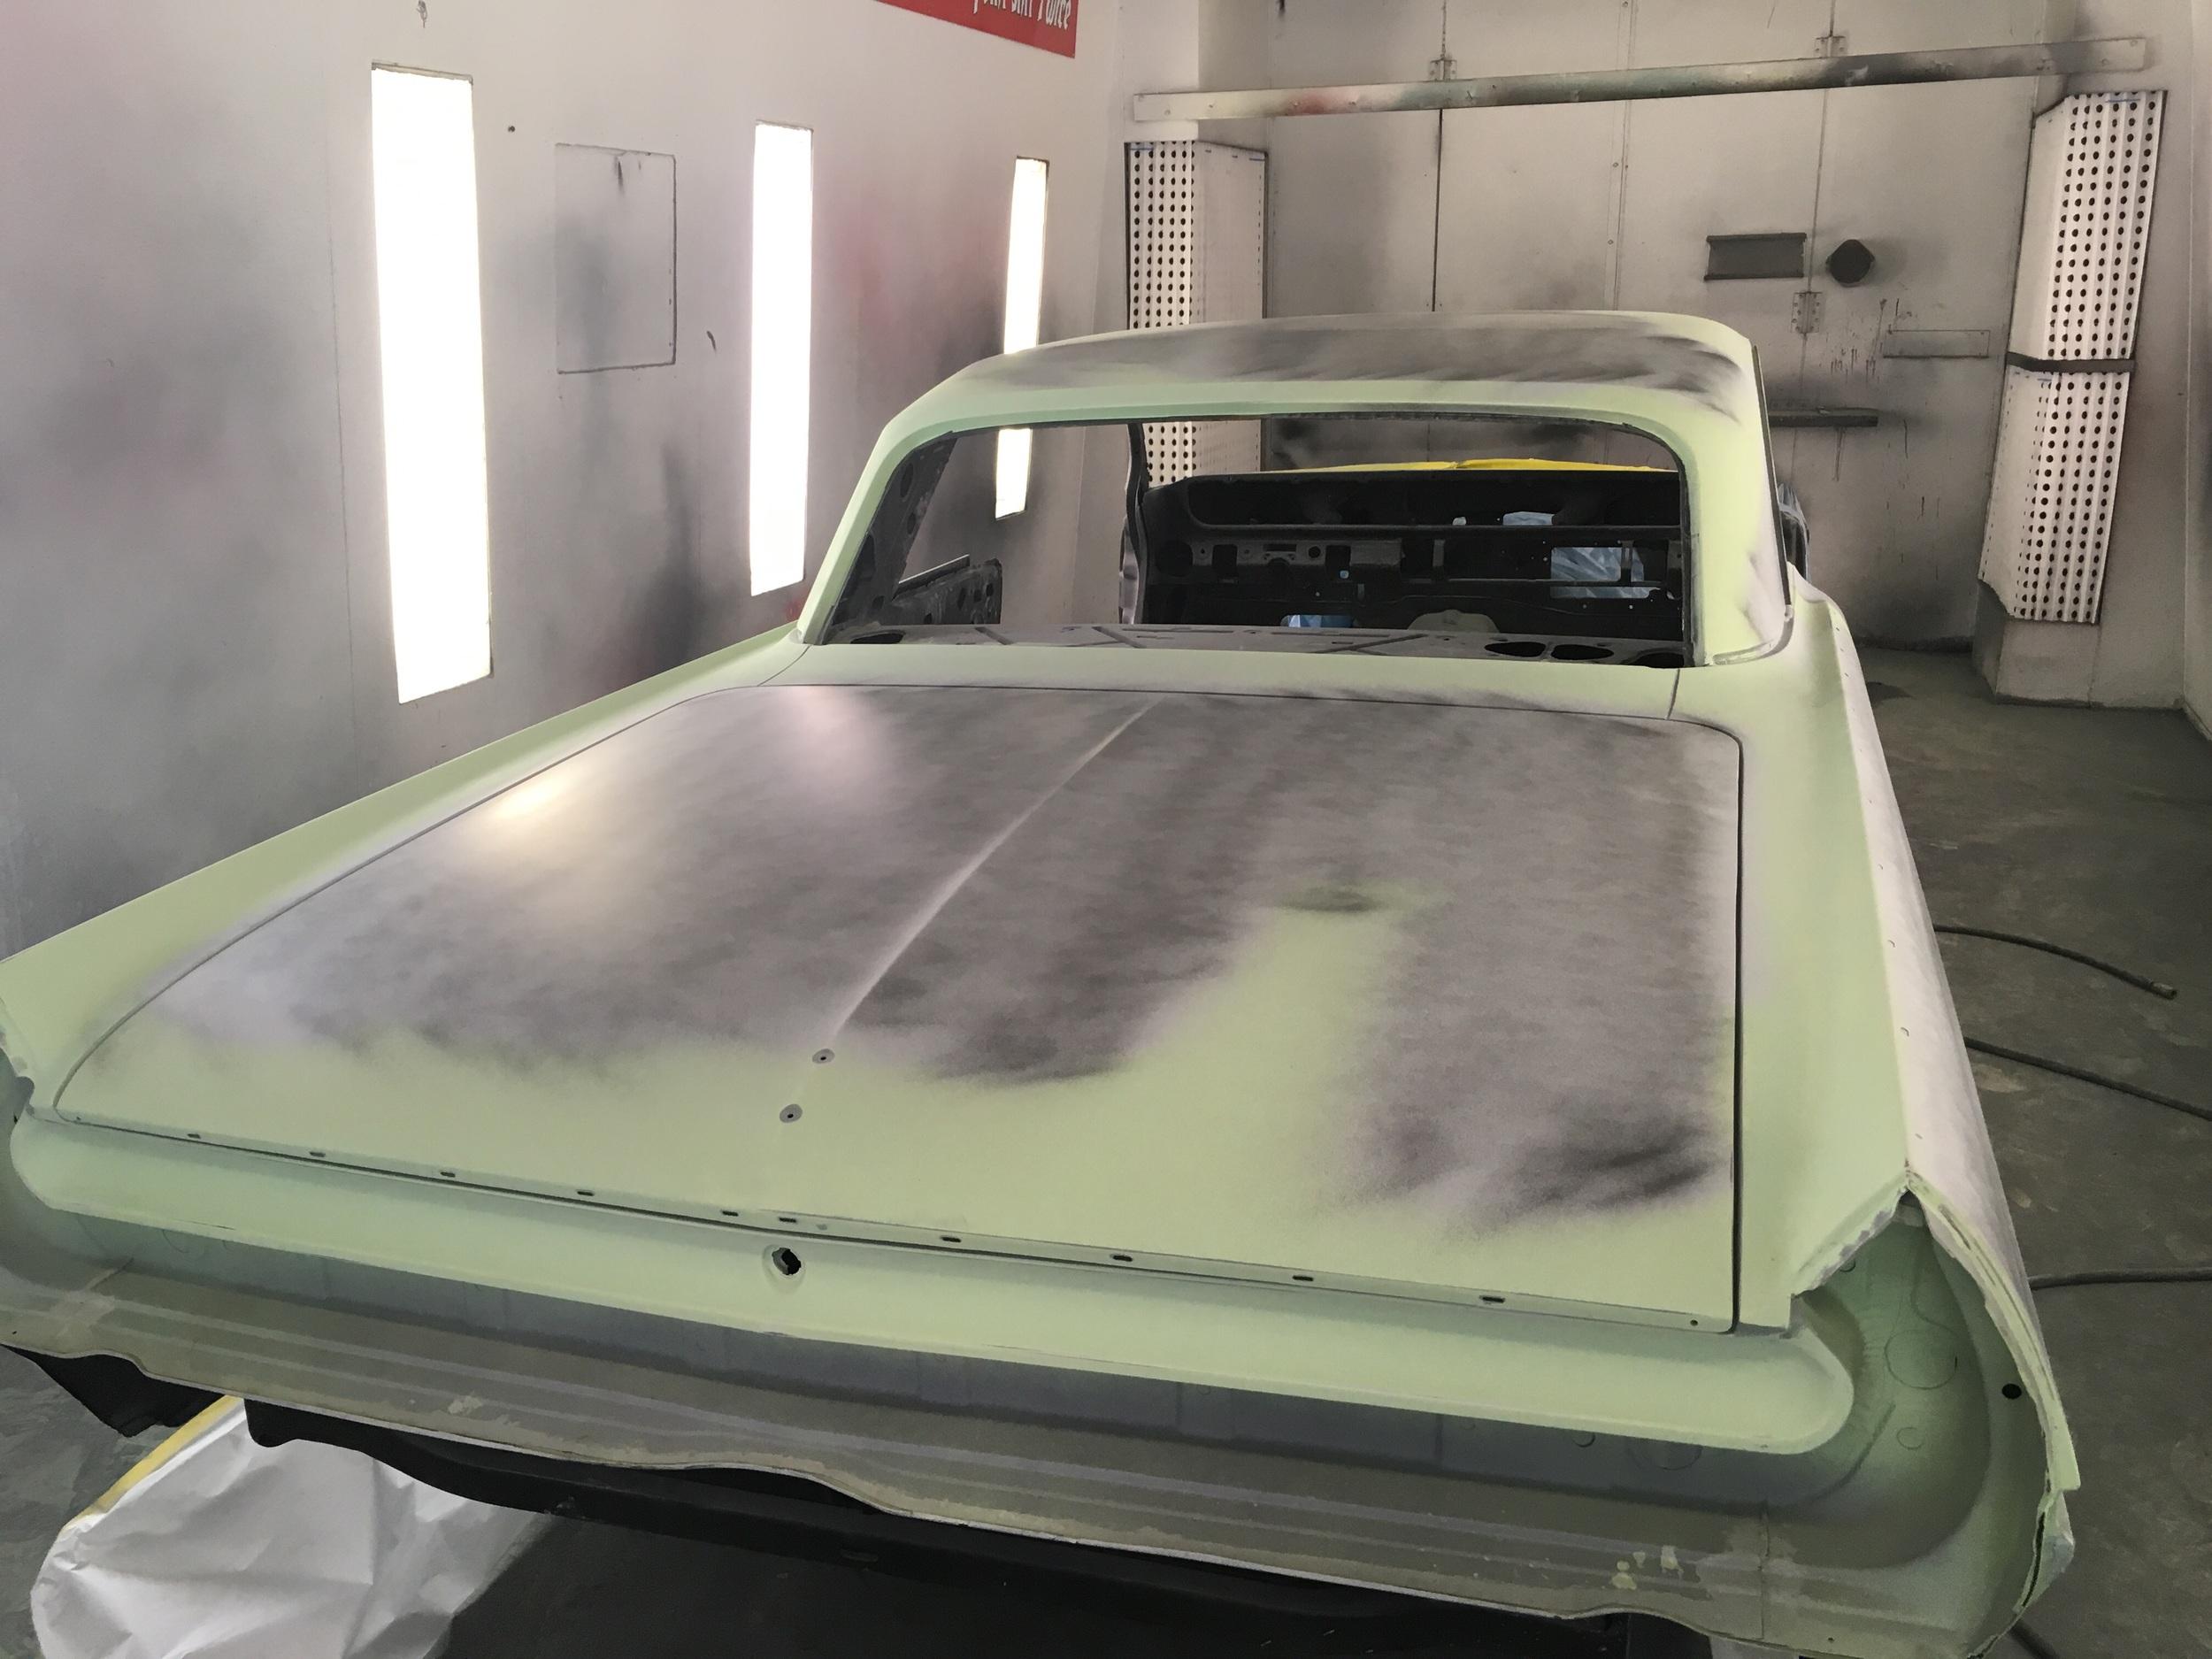 1962-Pontiac-Bonneville-minneapolis-hot-rod-custom-build-restoration-8.jpg